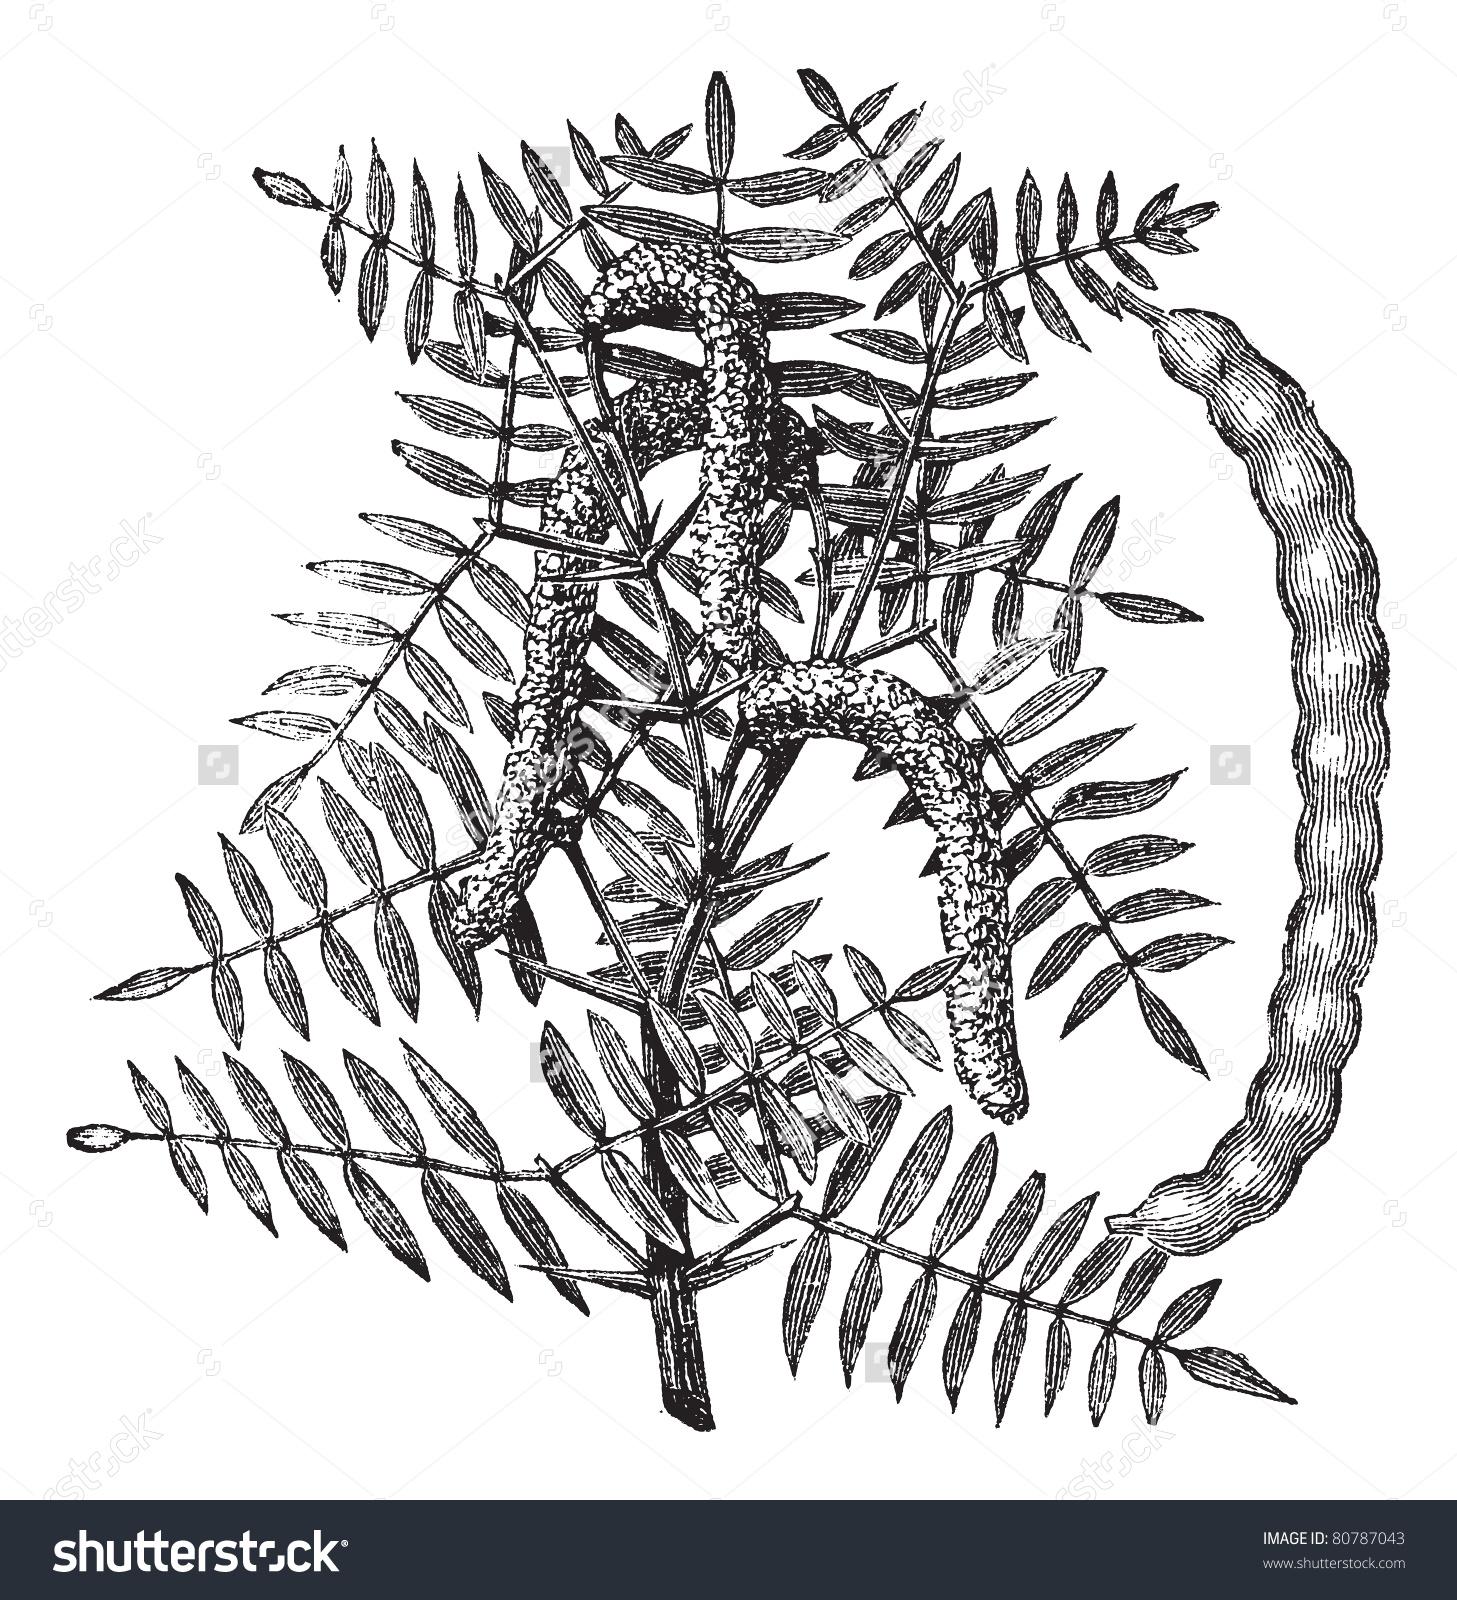 Mesquite (Prosopis Glandulosa) Or Honey Mesquite, Vintage Engraved.